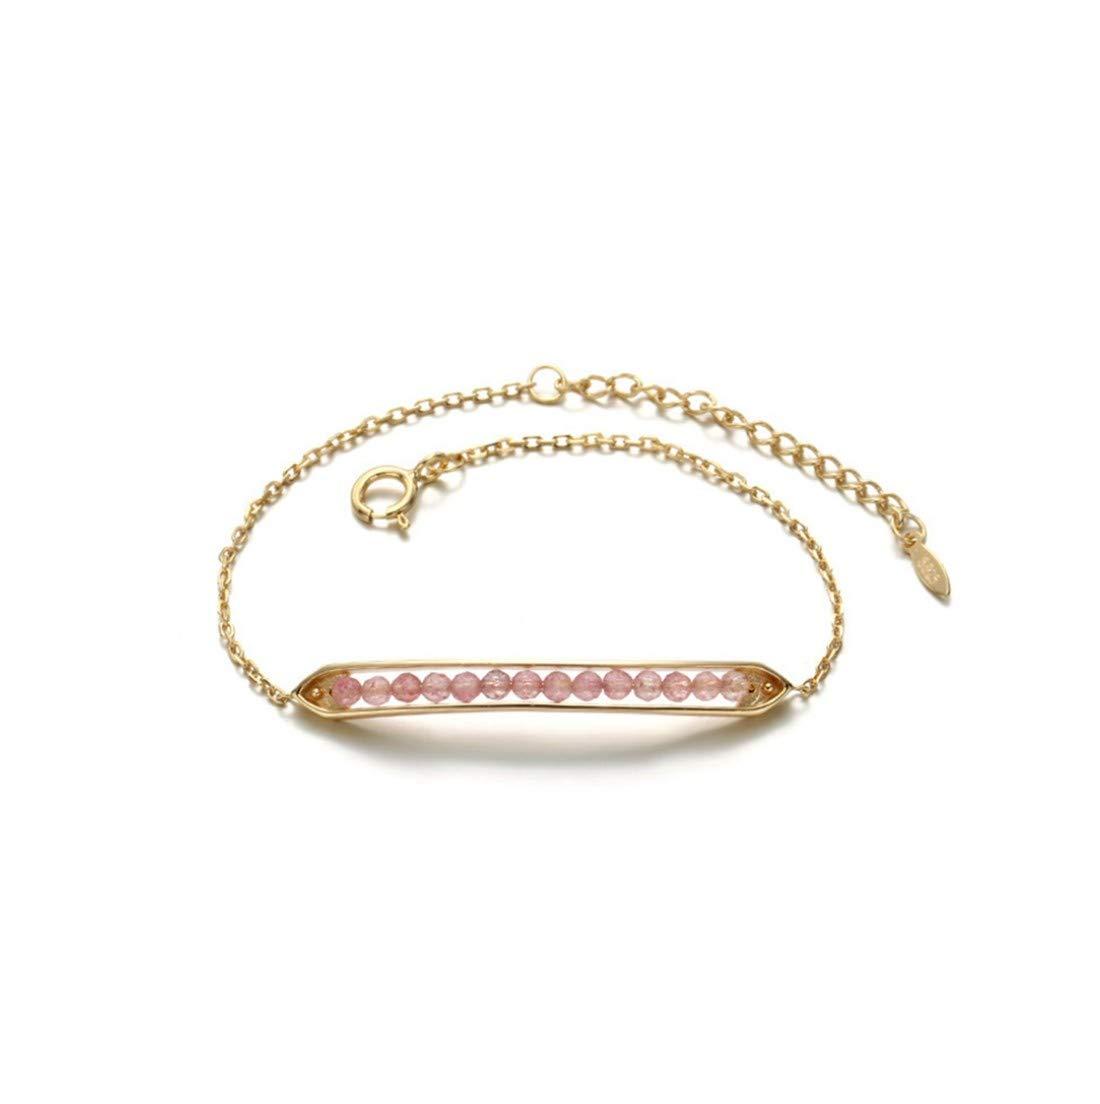 YIYIYYAレディースブレスレットS925スターリングシルバー繊細なジルコンエンドウ形の調節可能な結婚式の宝石類レディースジュエリーギフト、01   B07M5B3ZM8